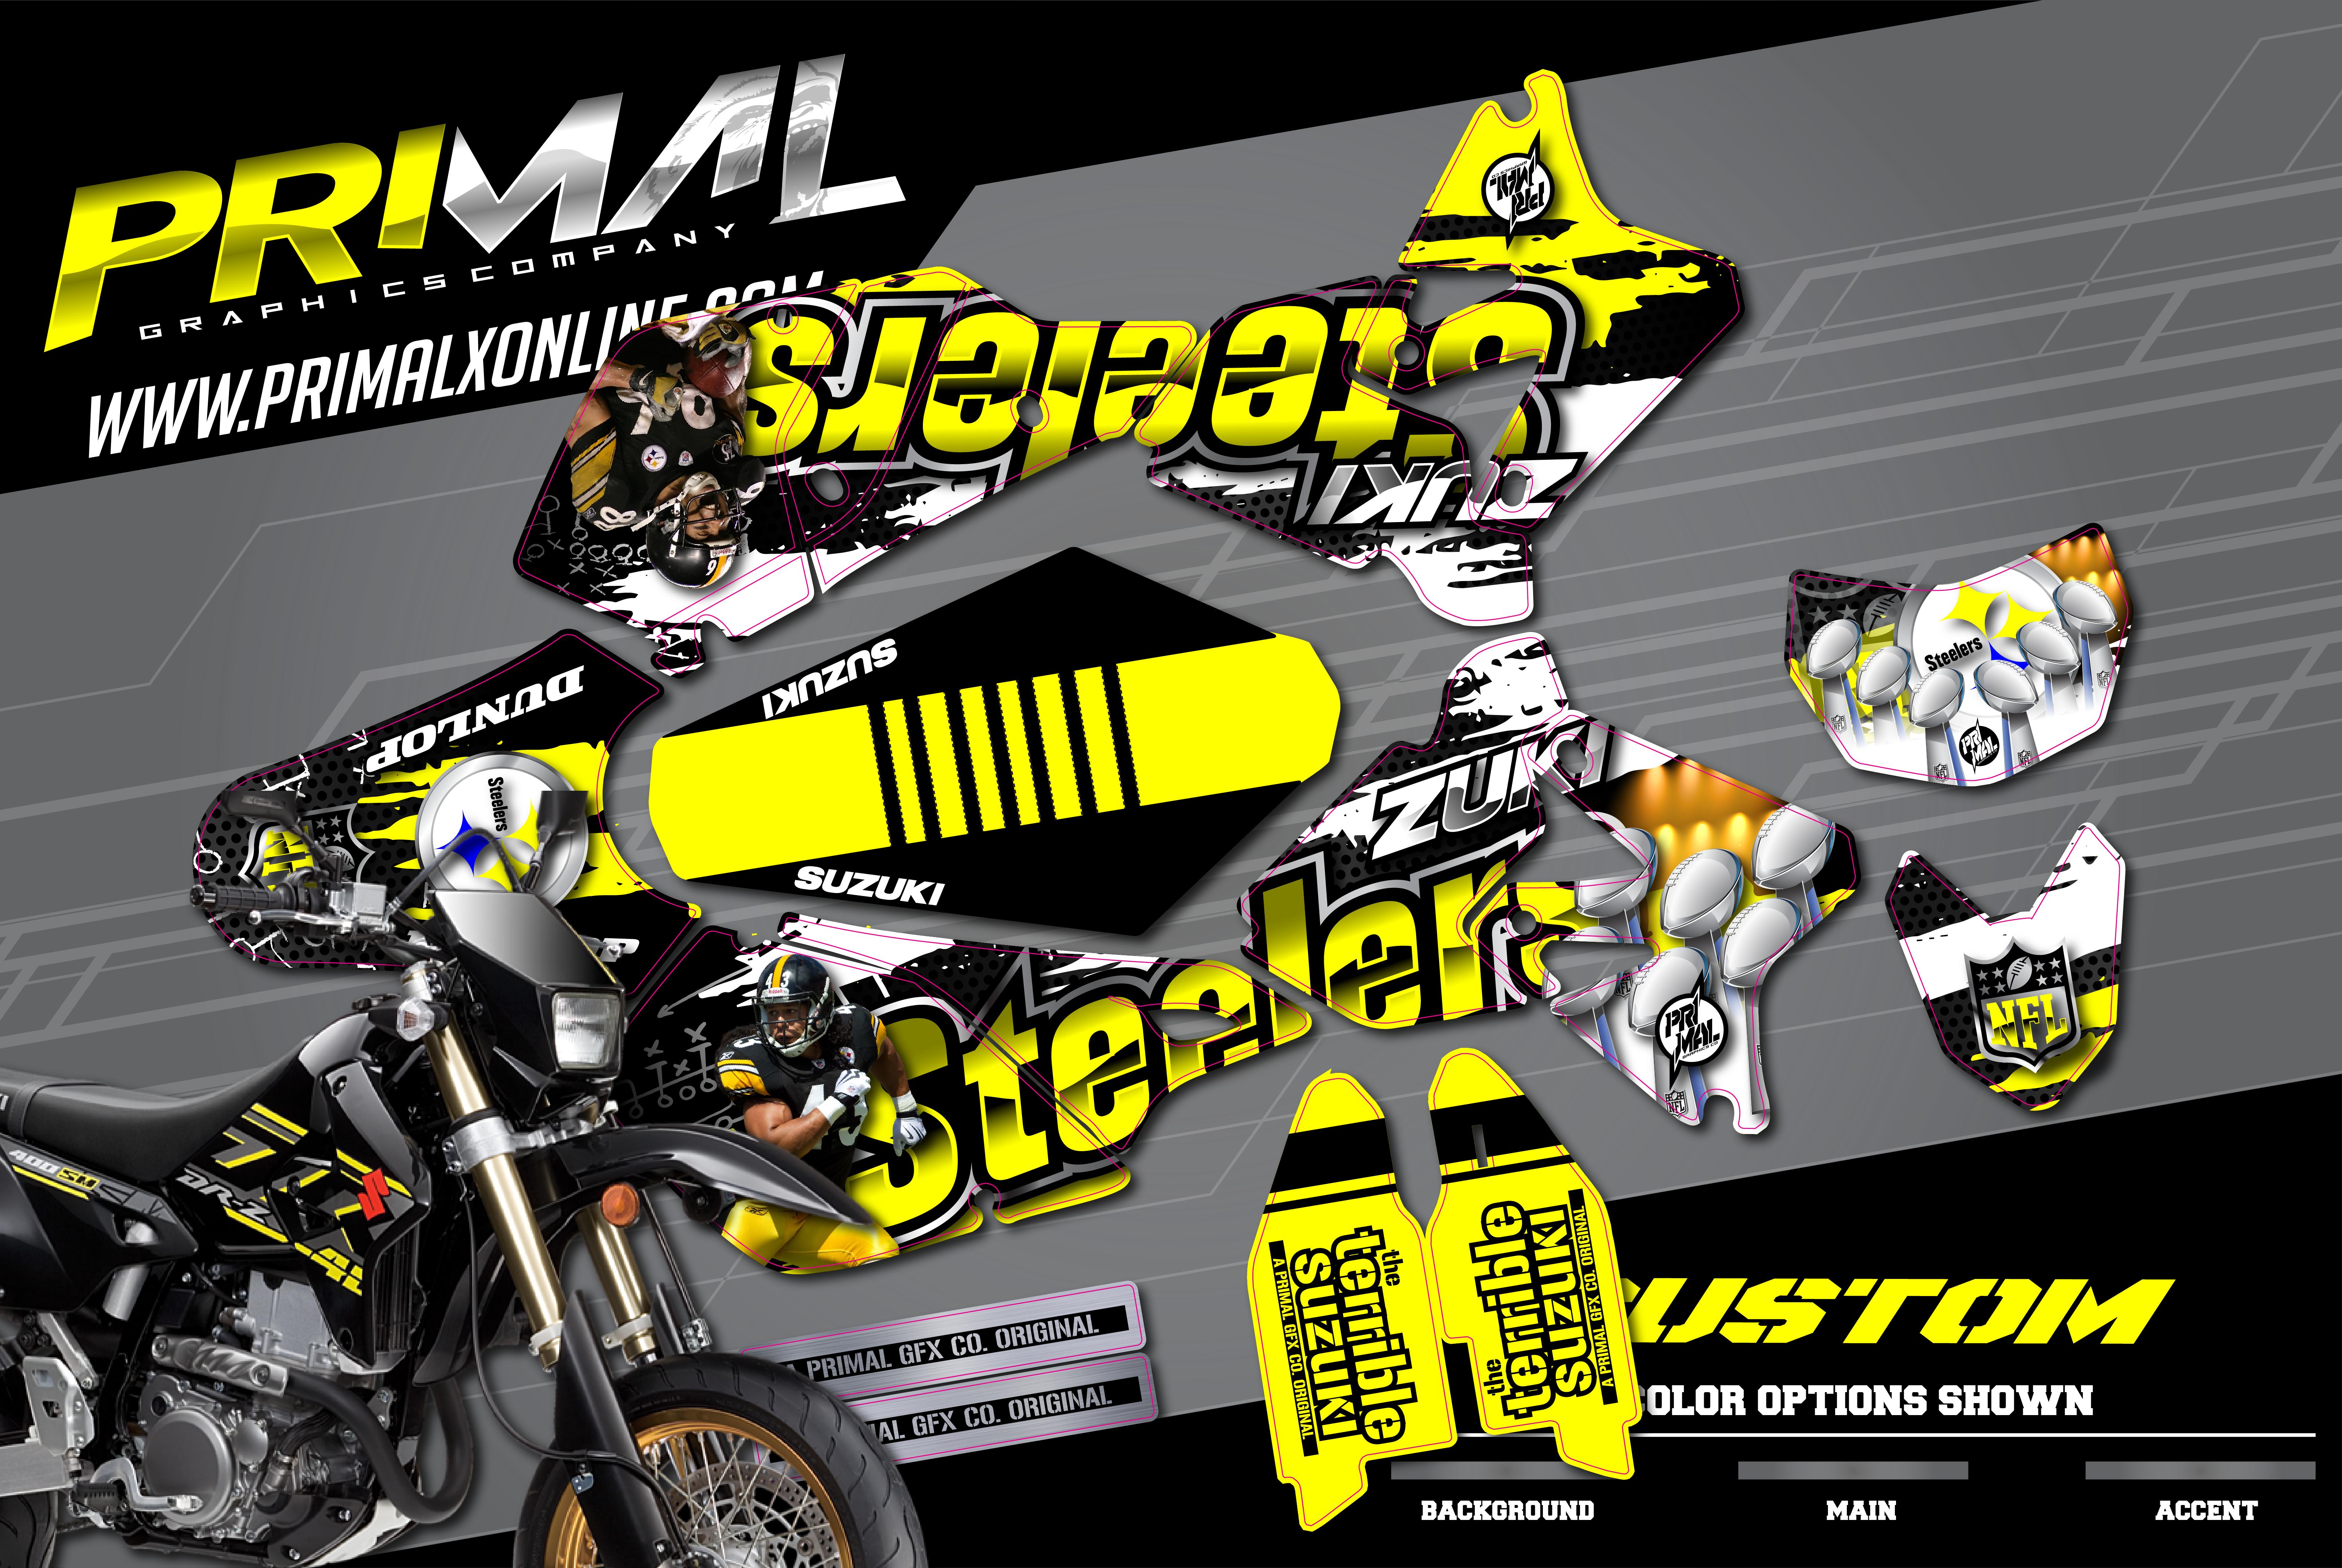 PRIMAL-X-MOTORSPORTS-PRIMAL-GRAPHICS-CO-2021-SUZUKI-DRZ400SM-MOTOCROSS-GRAPHICS-STEELERS-CHARM-CITY-KINGS-01